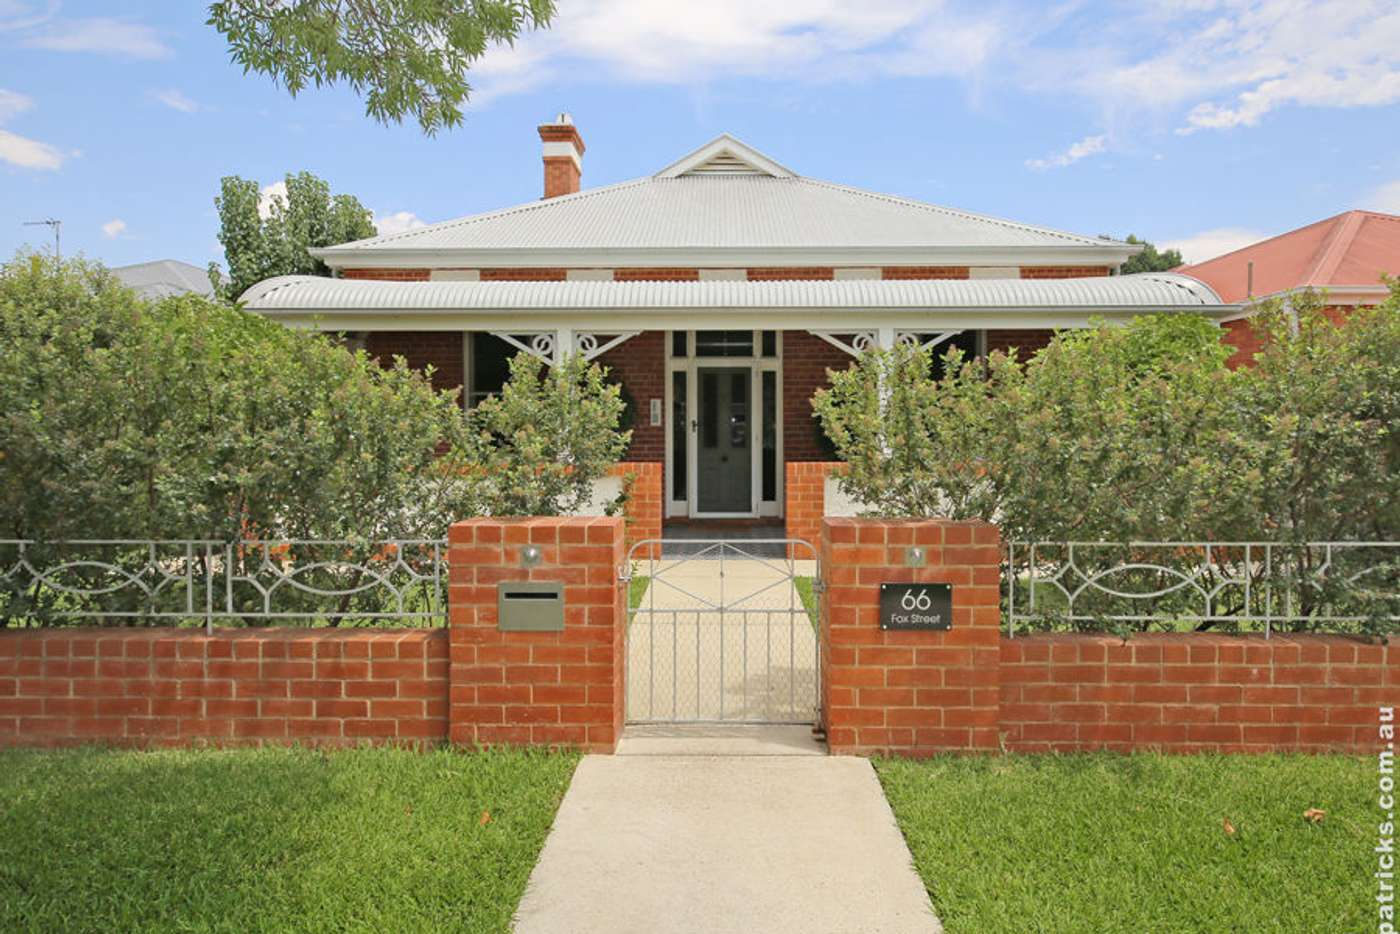 Main view of Homely house listing, 66 Fox Street, Wagga Wagga NSW 2650